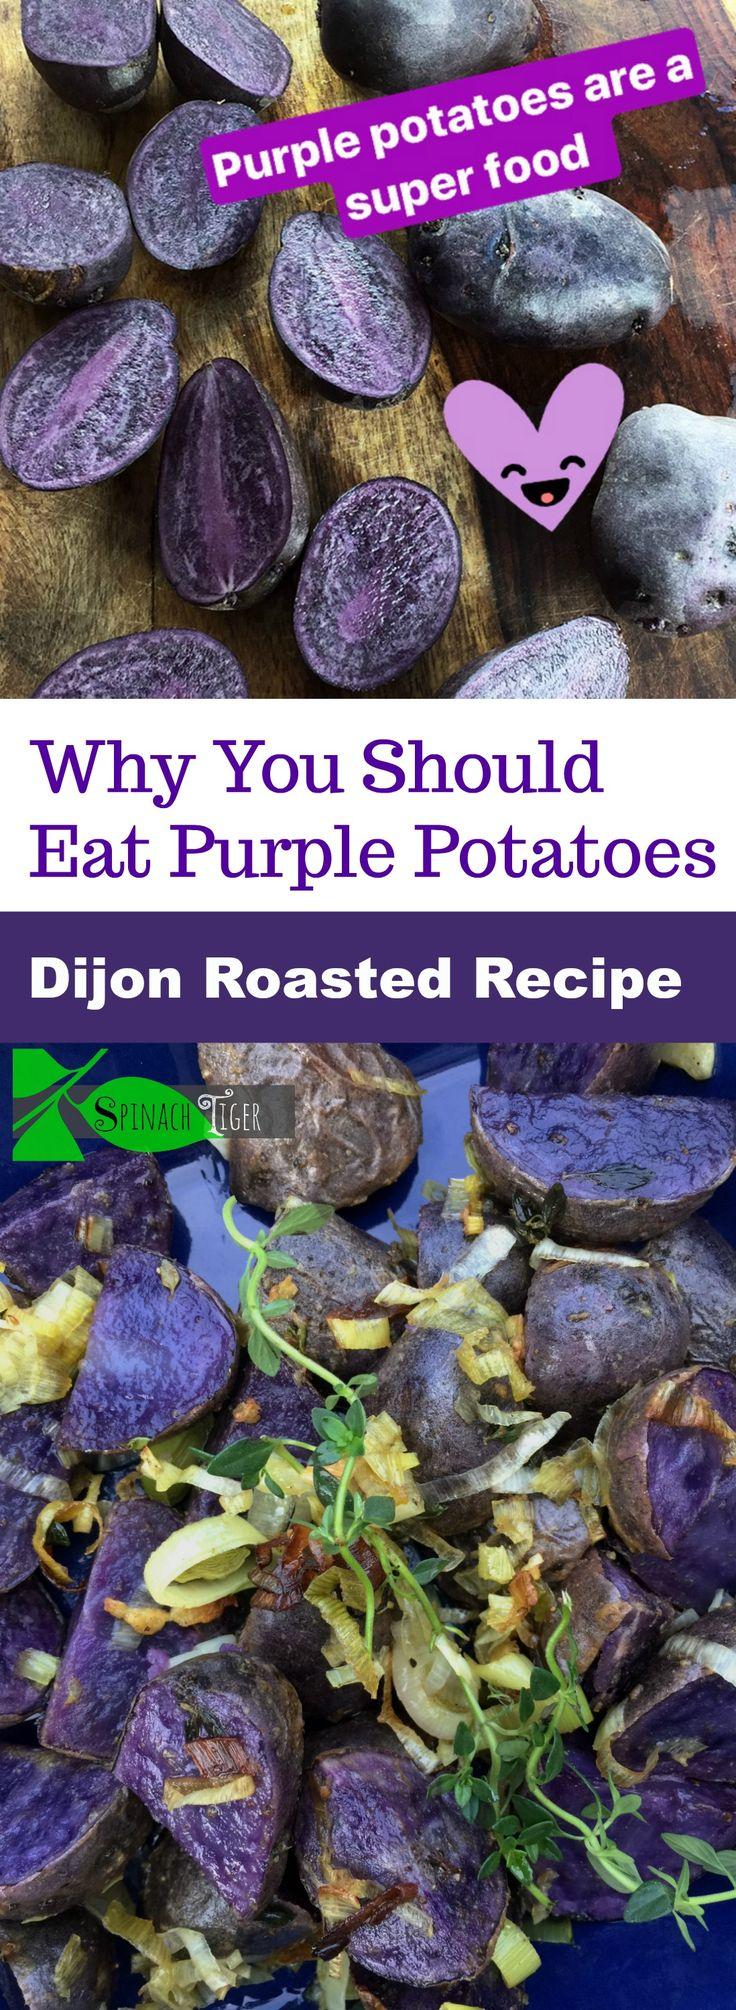 Big Fat Healthy Lemon Dijon Roasted Purple Potatoes - Spinach Tiger